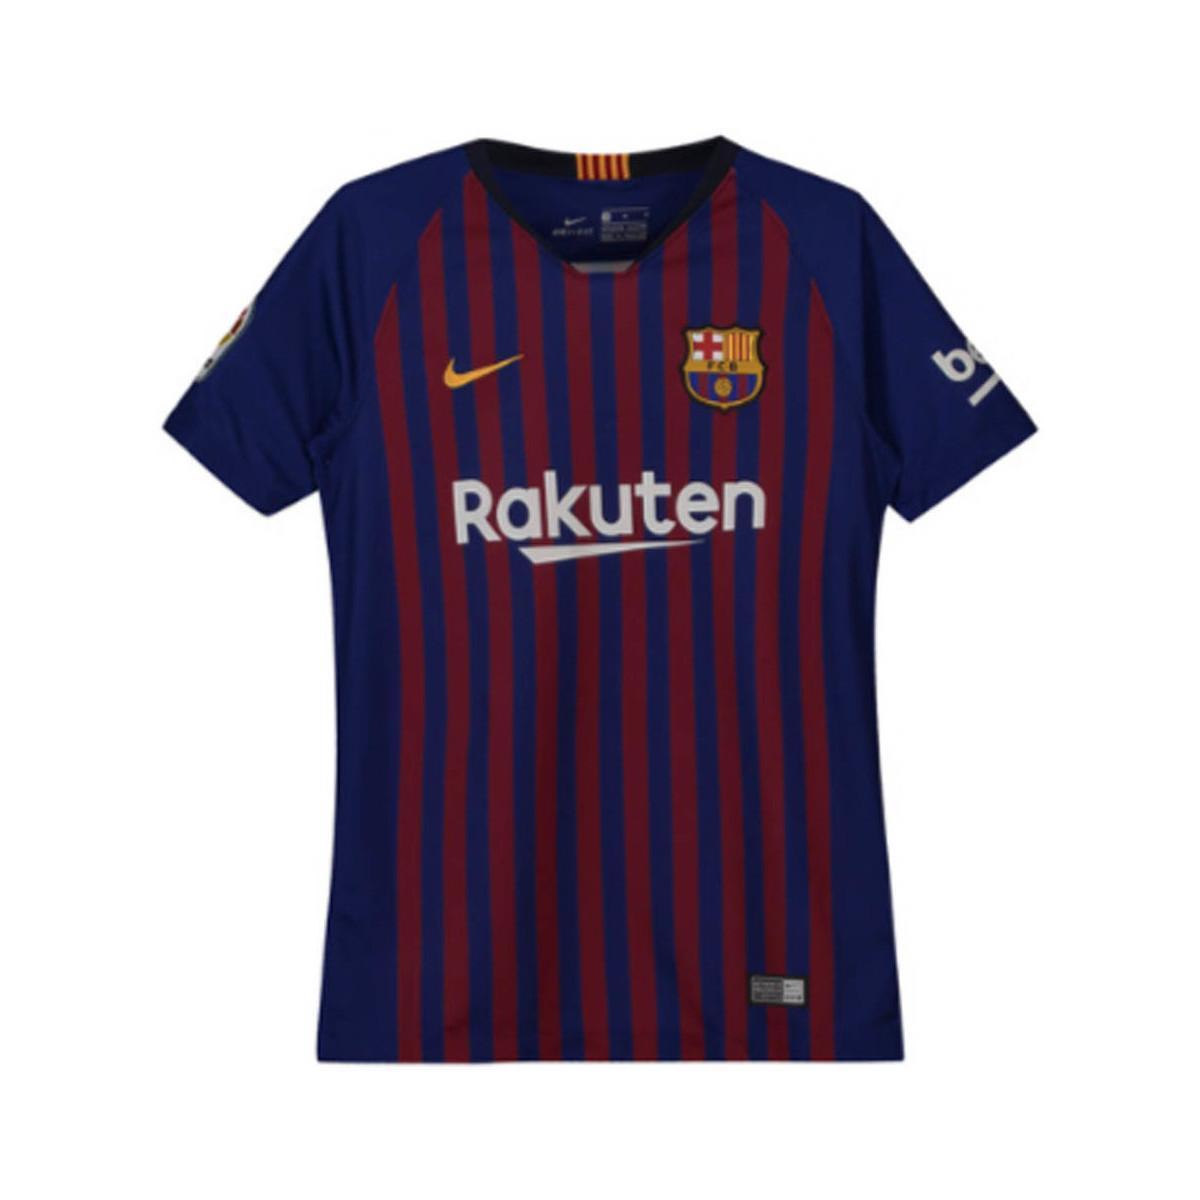 sports shoes e3414 31db0 Nike 2018-2019 Barcelona Home Football Shirt Women's T Shirt ...